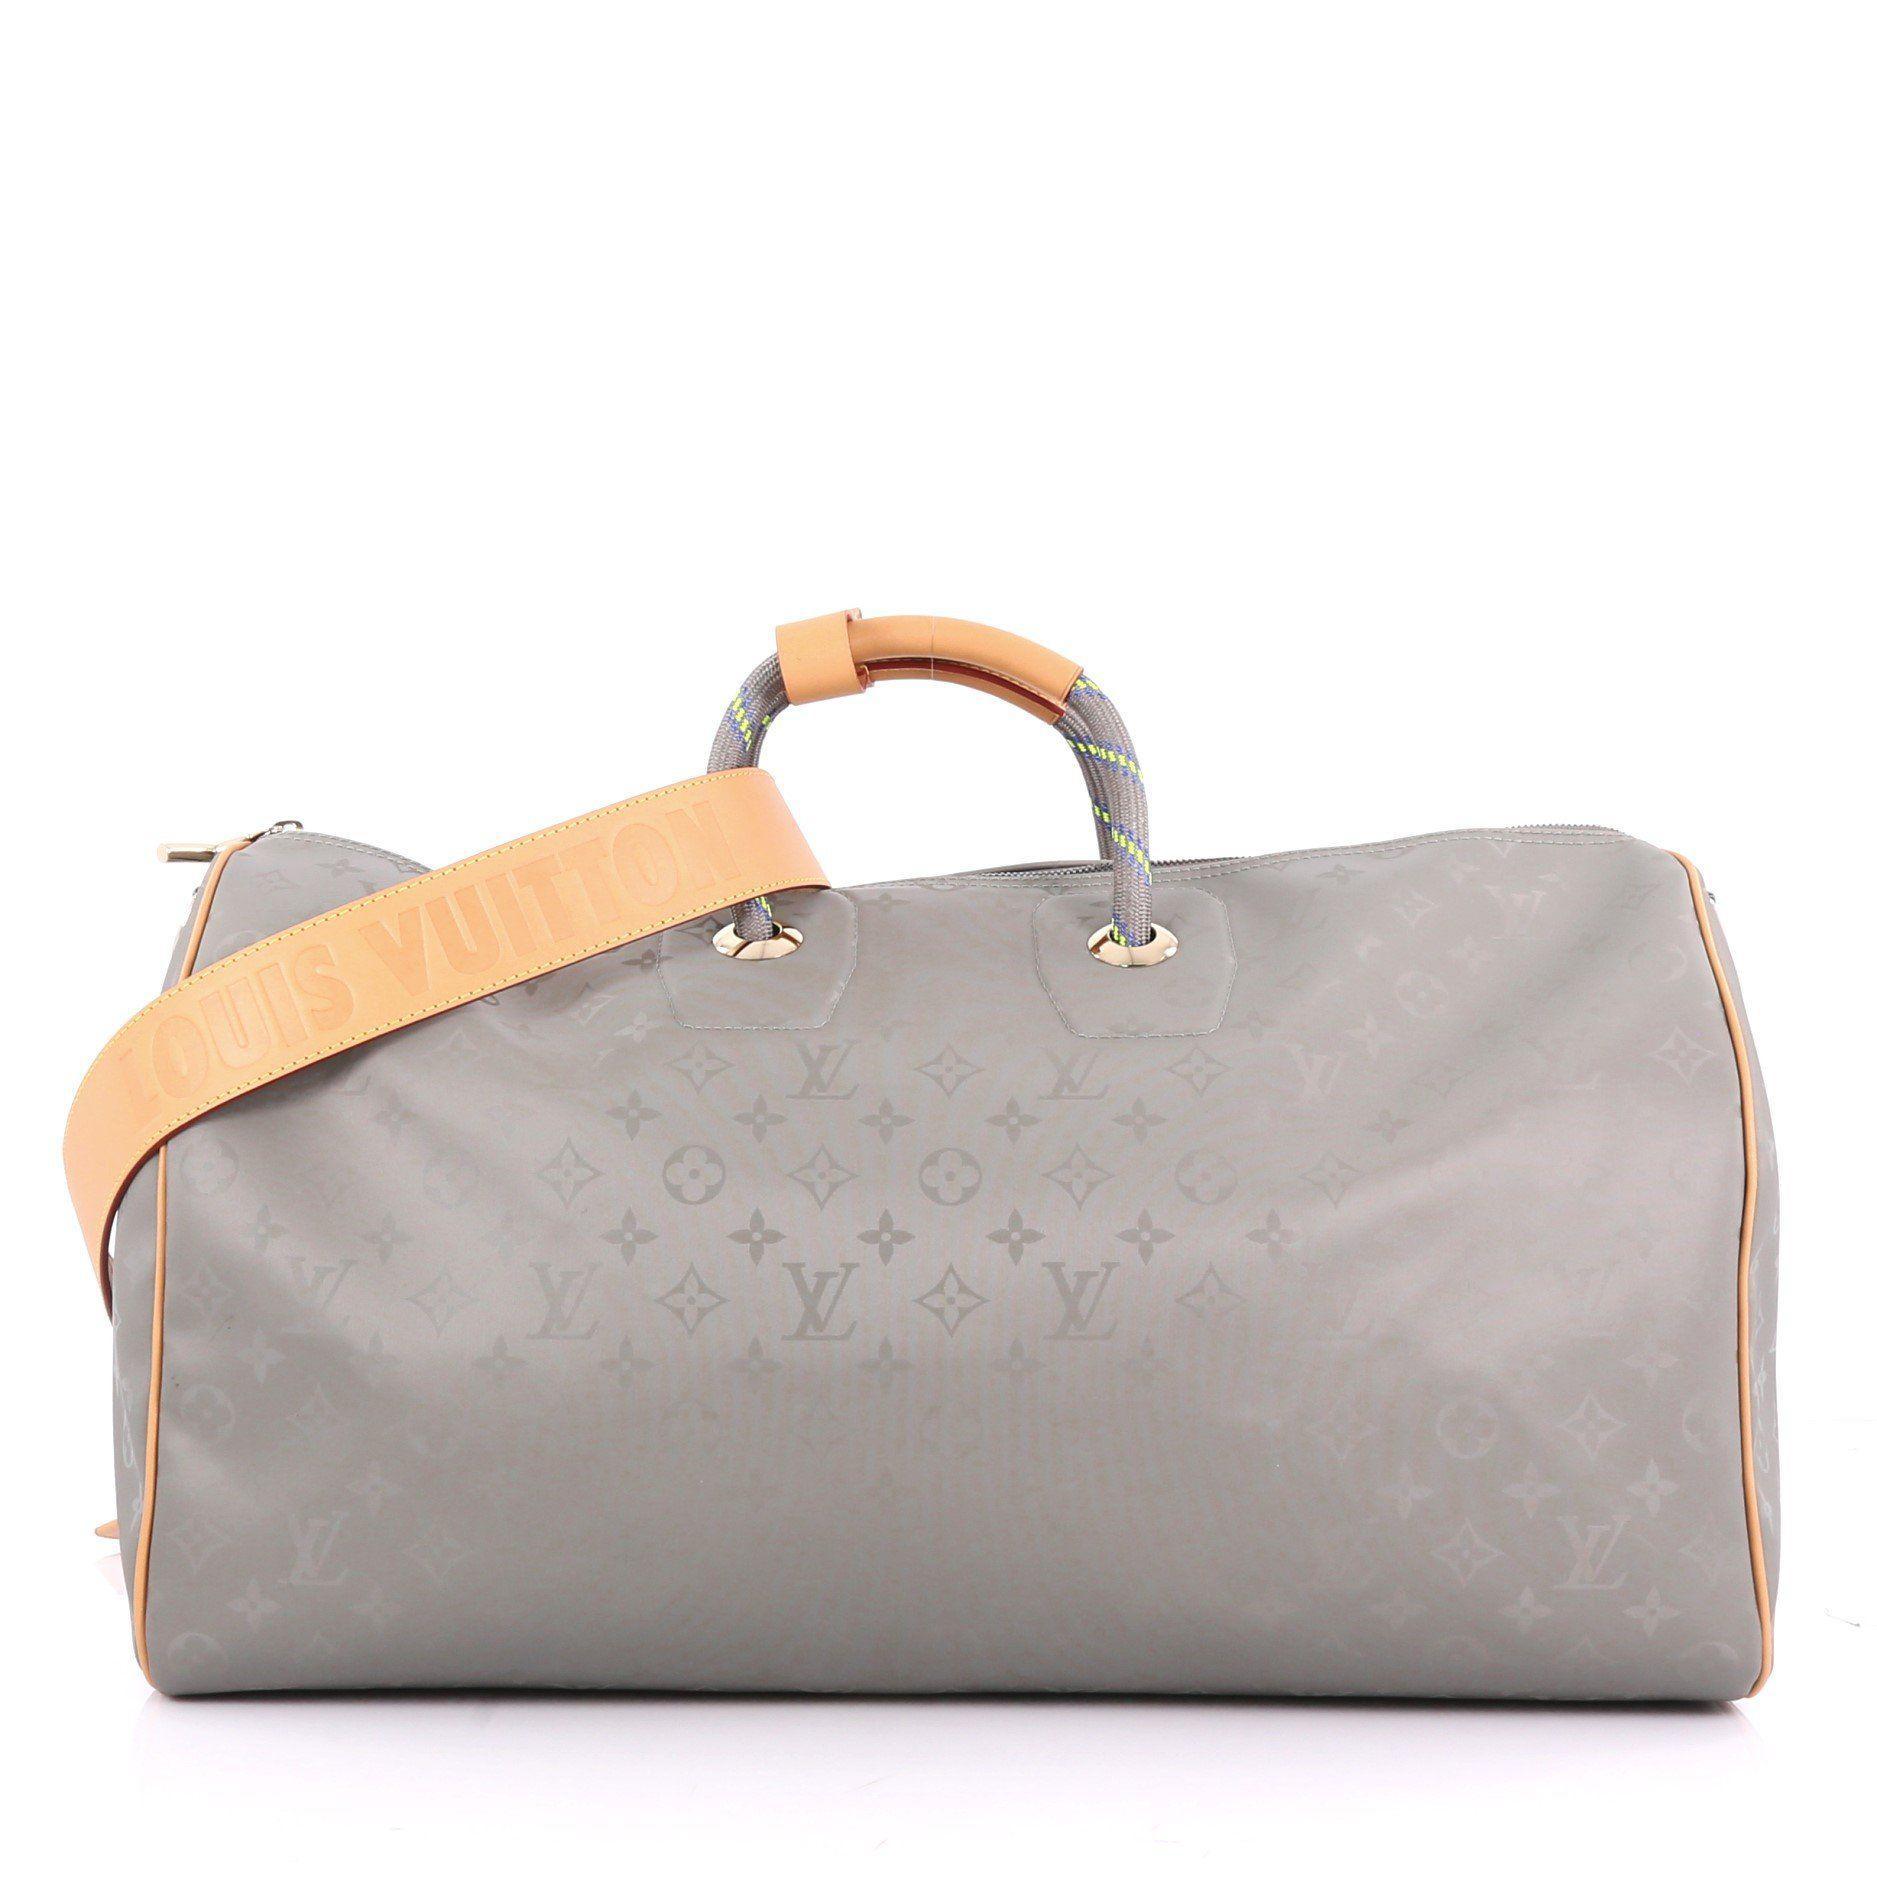 5d6a3792ea4f Louis Vuitton. Women s Gray Pre Owned Keepall Bandouliere Bag Limited  Edition Titanium Monogram Canvas 50